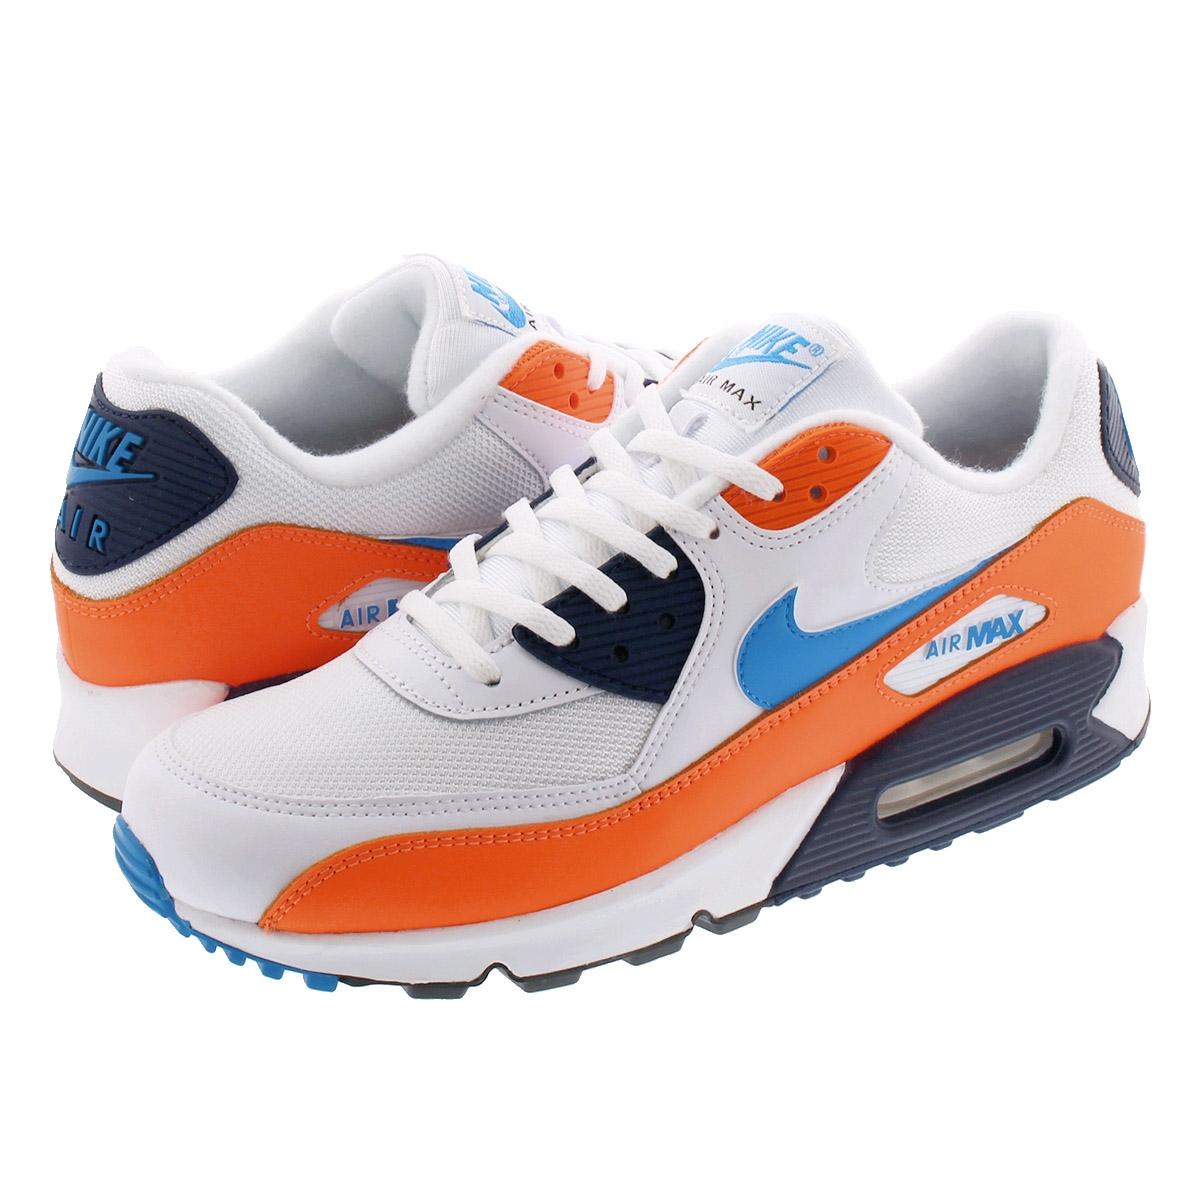 air max 90 essential white/photo blue-total orange